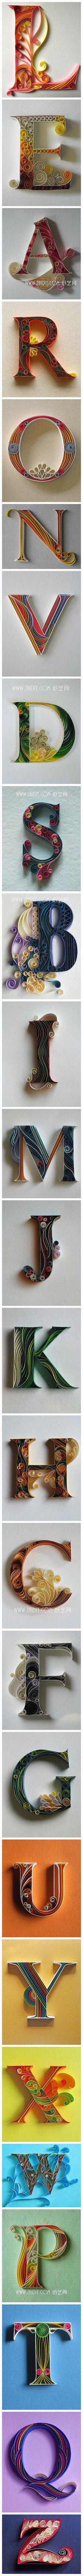 DIY Alphabet -papier. (http://www.duitang.com/people/mblog/49519764/detail/)